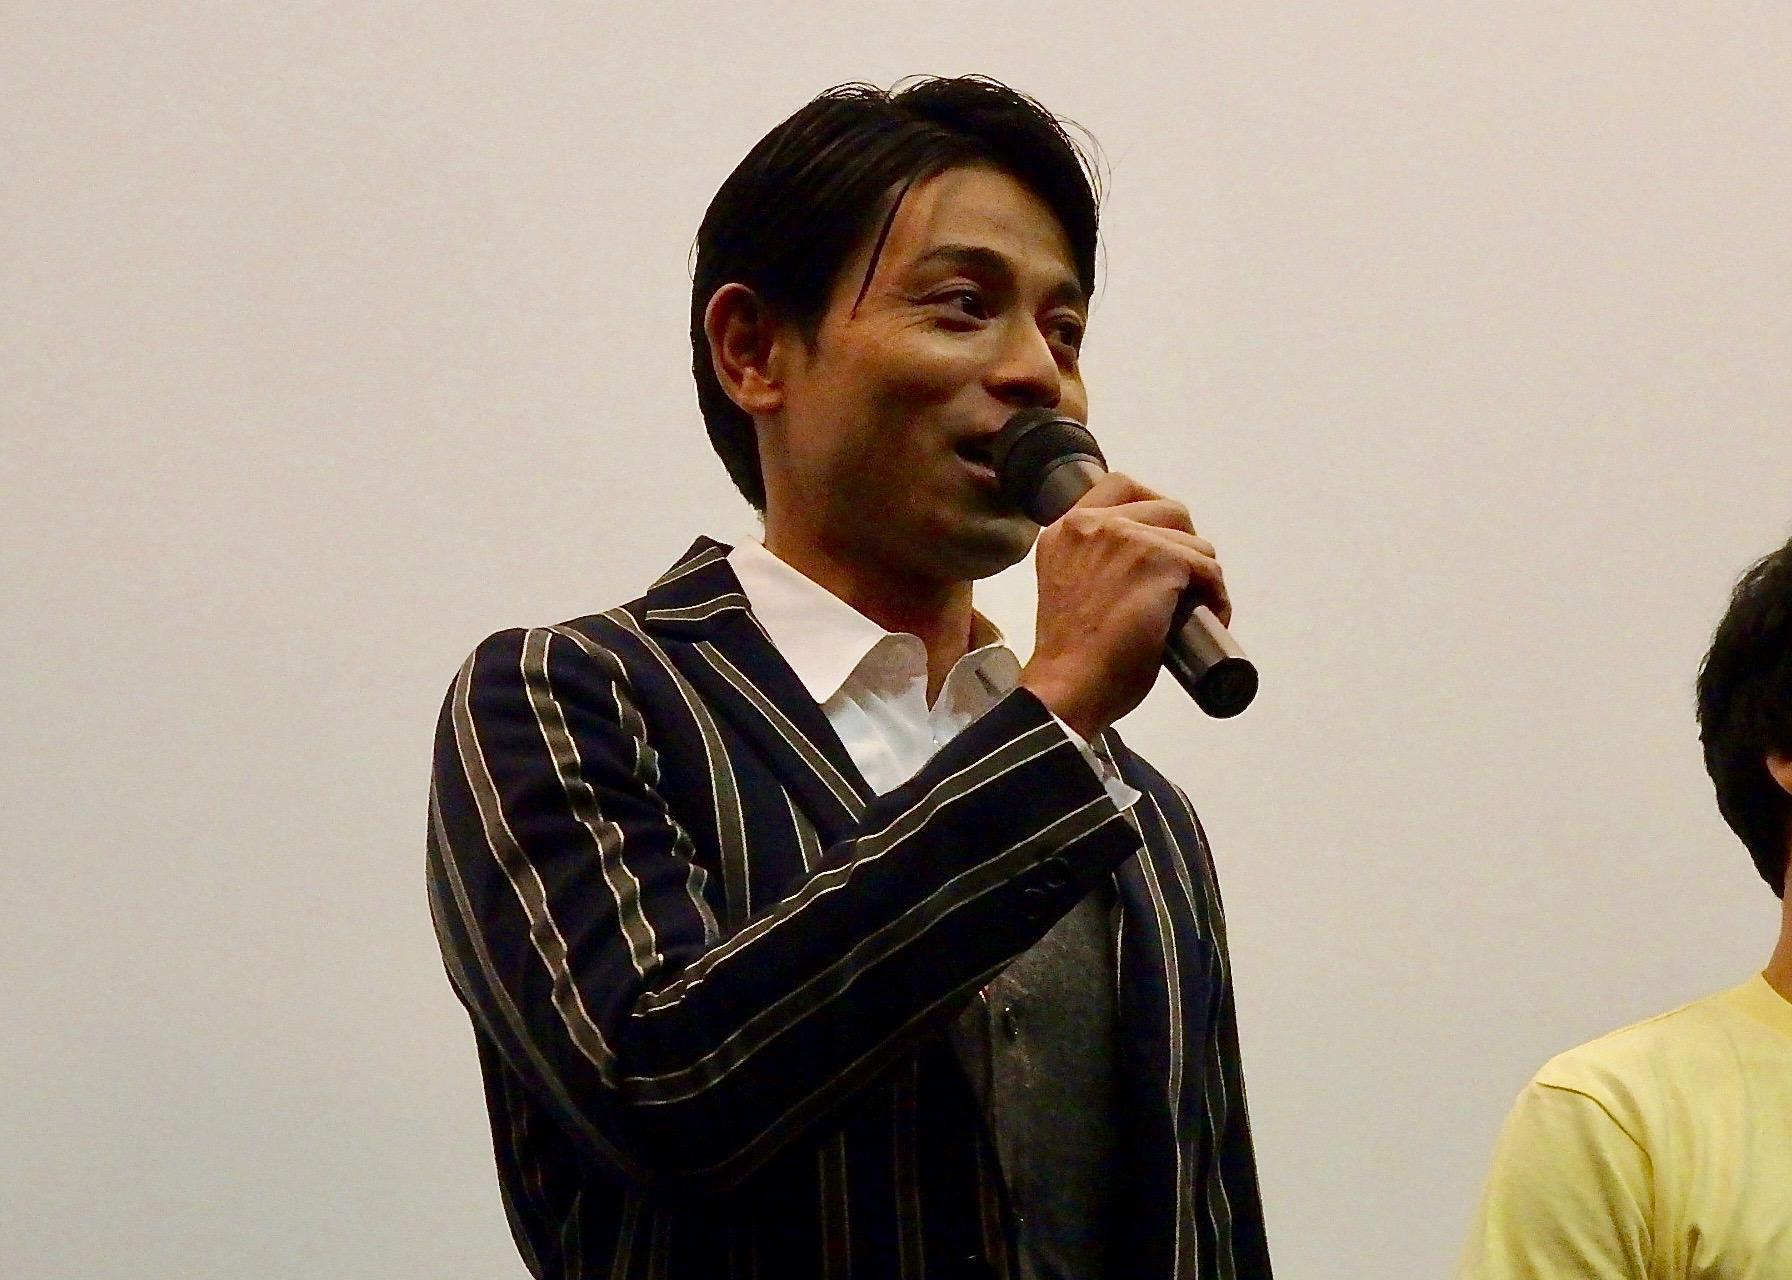 http://news.yoshimoto.co.jp/20171112002229-ff308ac07ca7d2eb5c240cc84e98073d0c1a8695.jpg